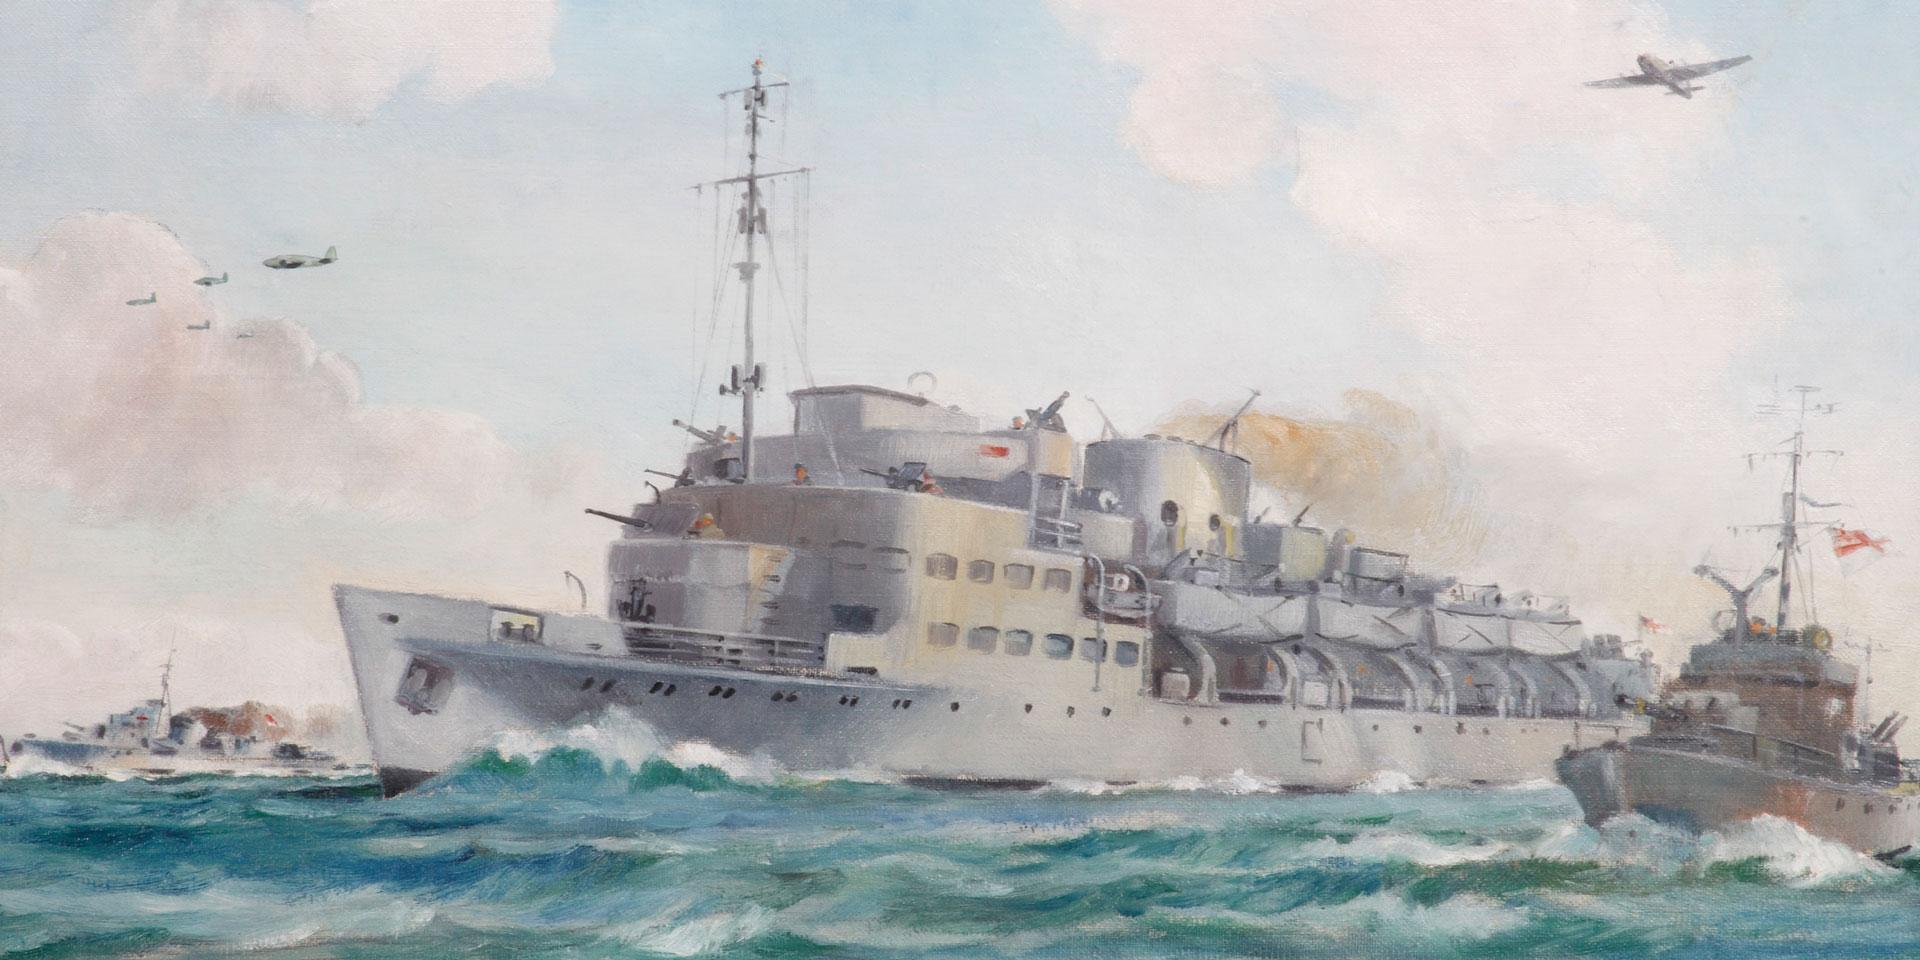 HMS 'Prins Albert' en route to Dieppe carrying No 4 Commando, August 1942